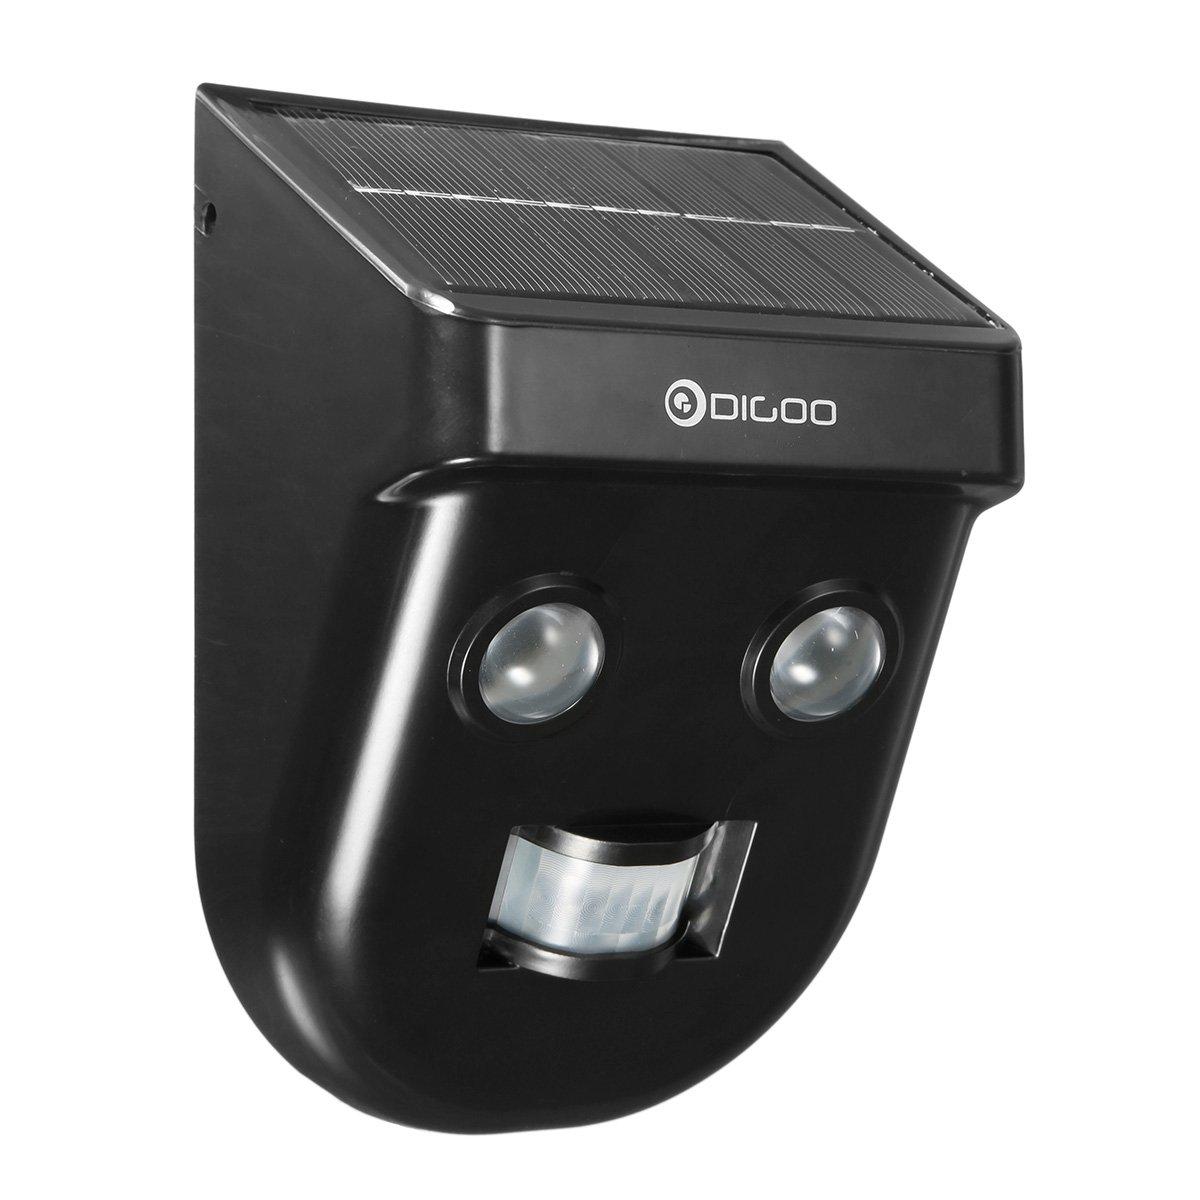 DIGOO DG-SSR-1 Lampada solare, Solar Gardener Wireless PIR Sensore Lunga Distanza Impermeabile Fuori Dall'esterno Mural Wuulihui_DE DIGOOWuulihuiDE241